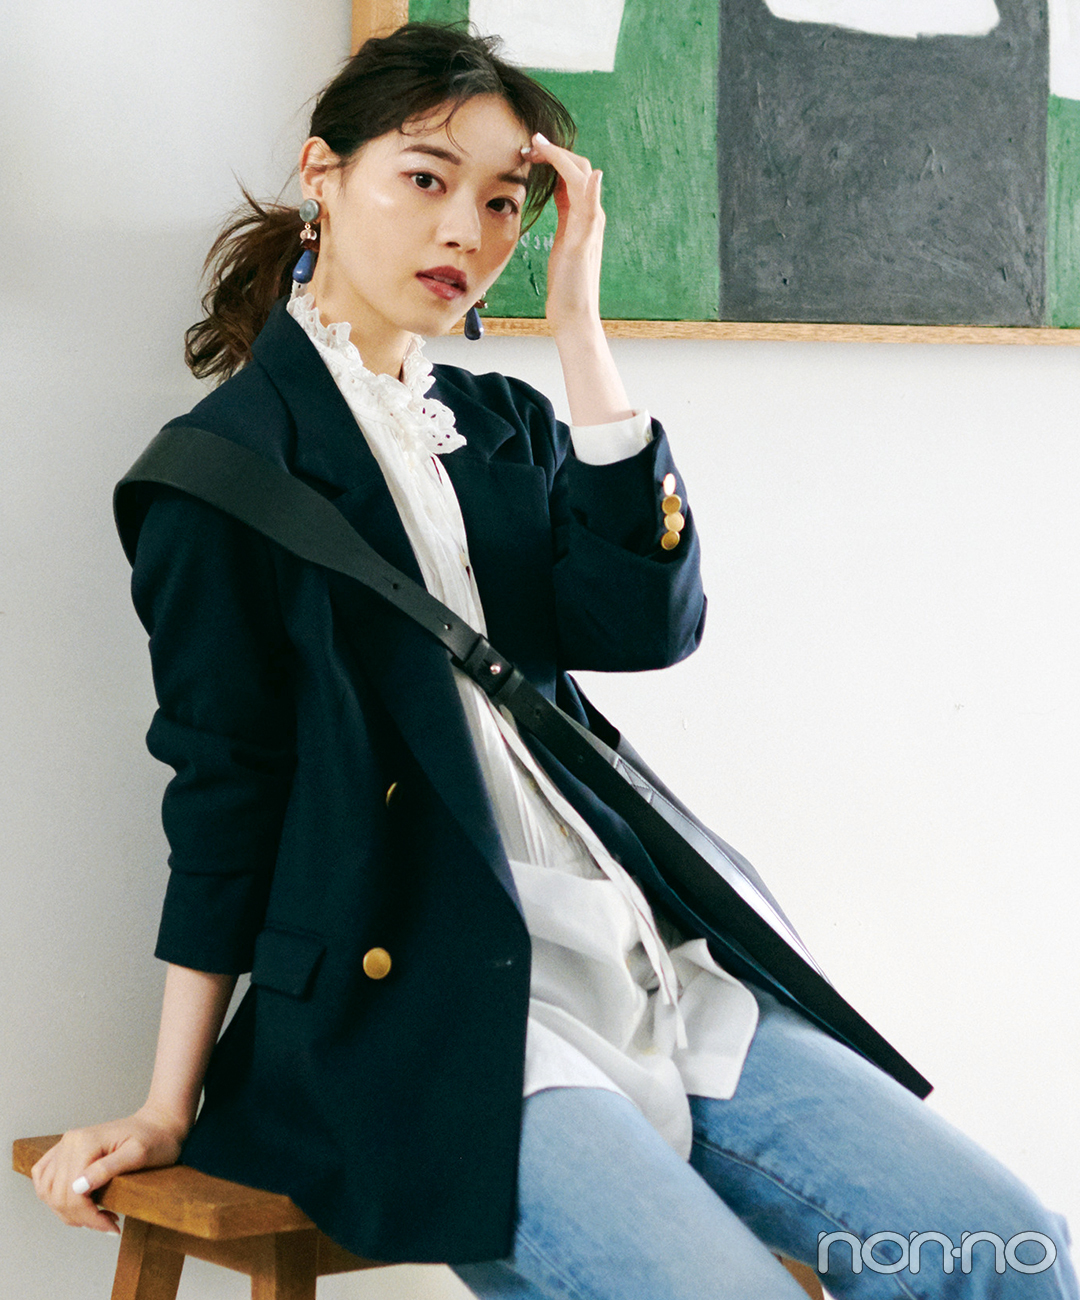 Photo Gallery|モデル・西野七瀬の最新フォトギャラリーを見る_1_12